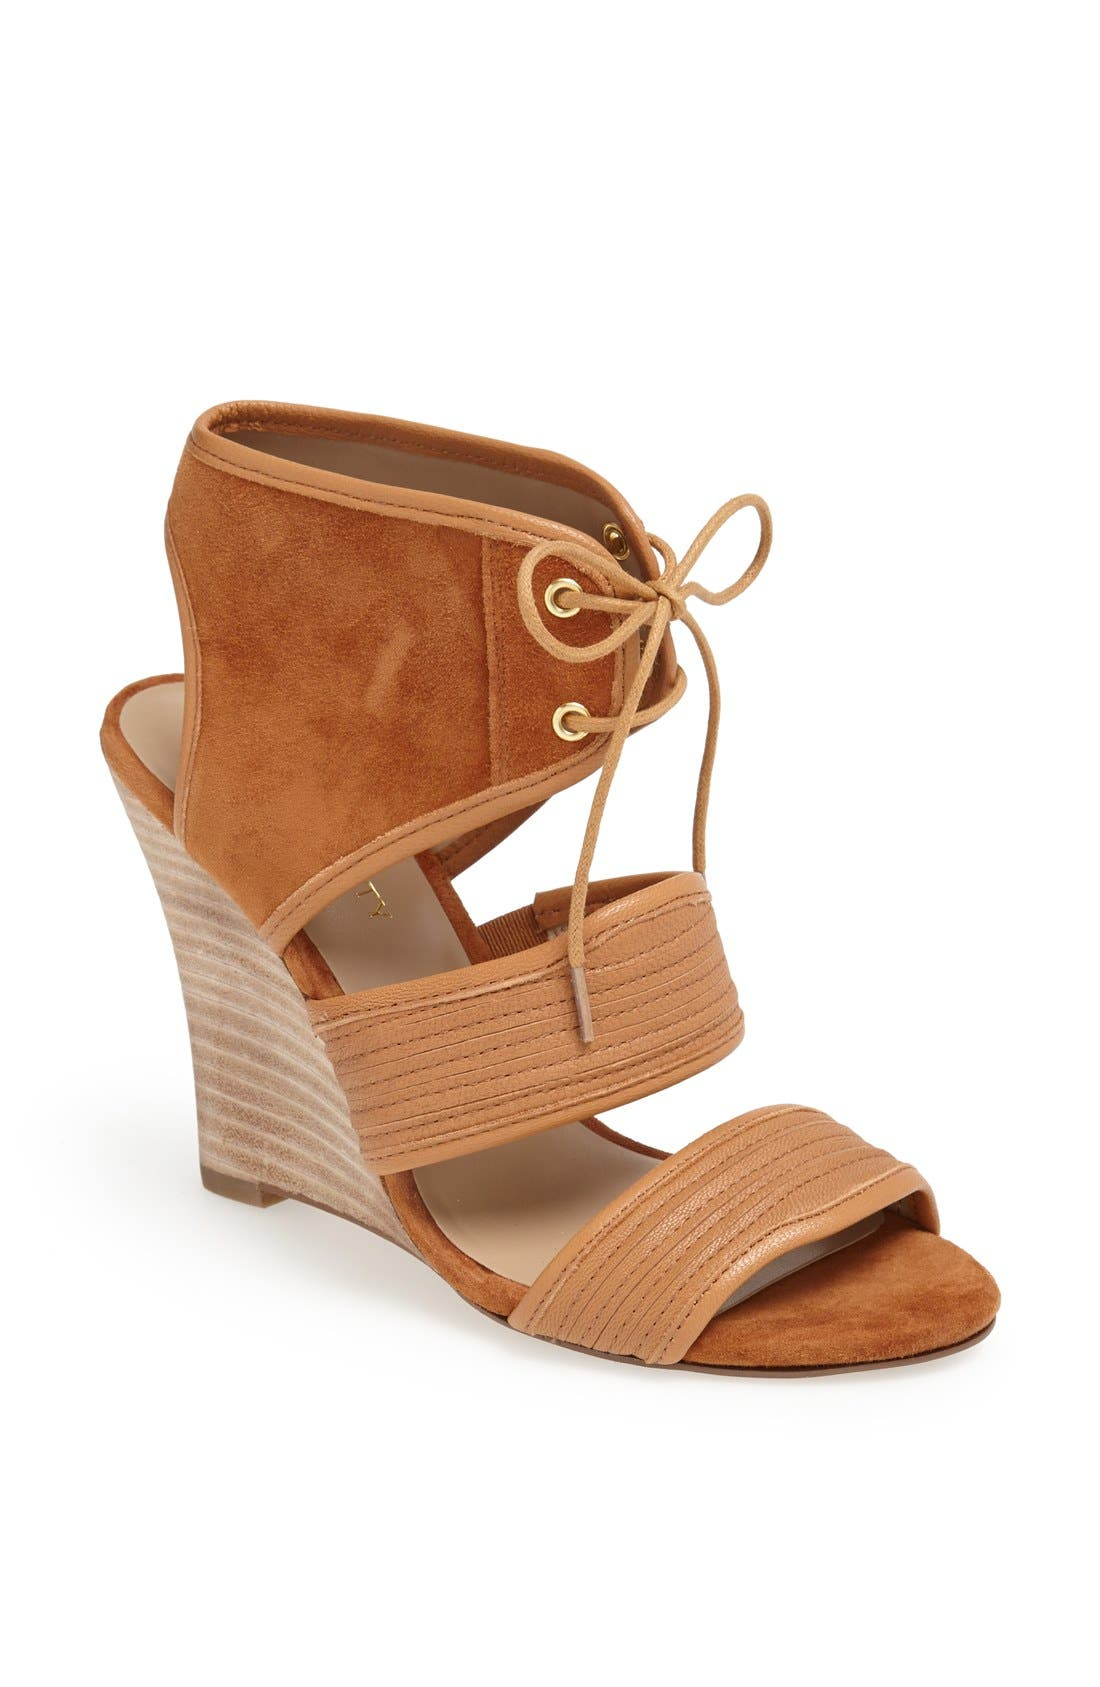 Alternate Image 1 Selected - Sole Society 'Khalessi' Sandal